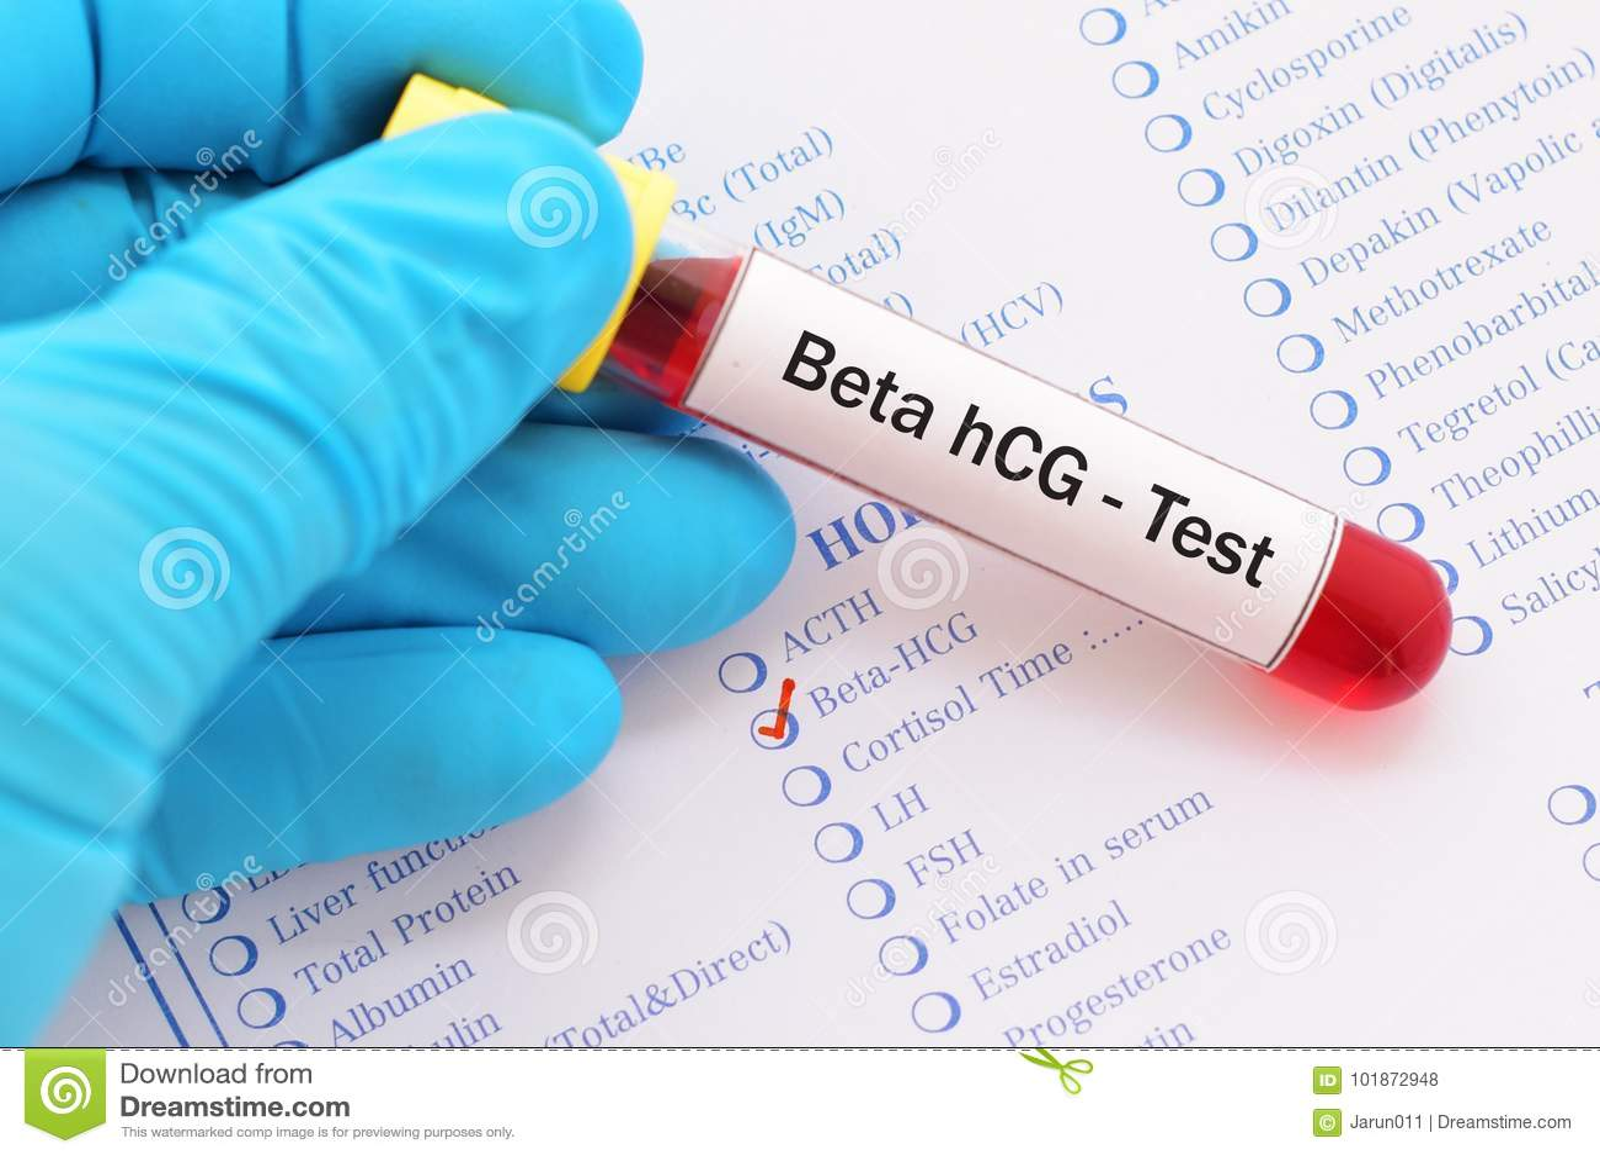 Beta hCG test stock photo. Image of ovarian, ovary